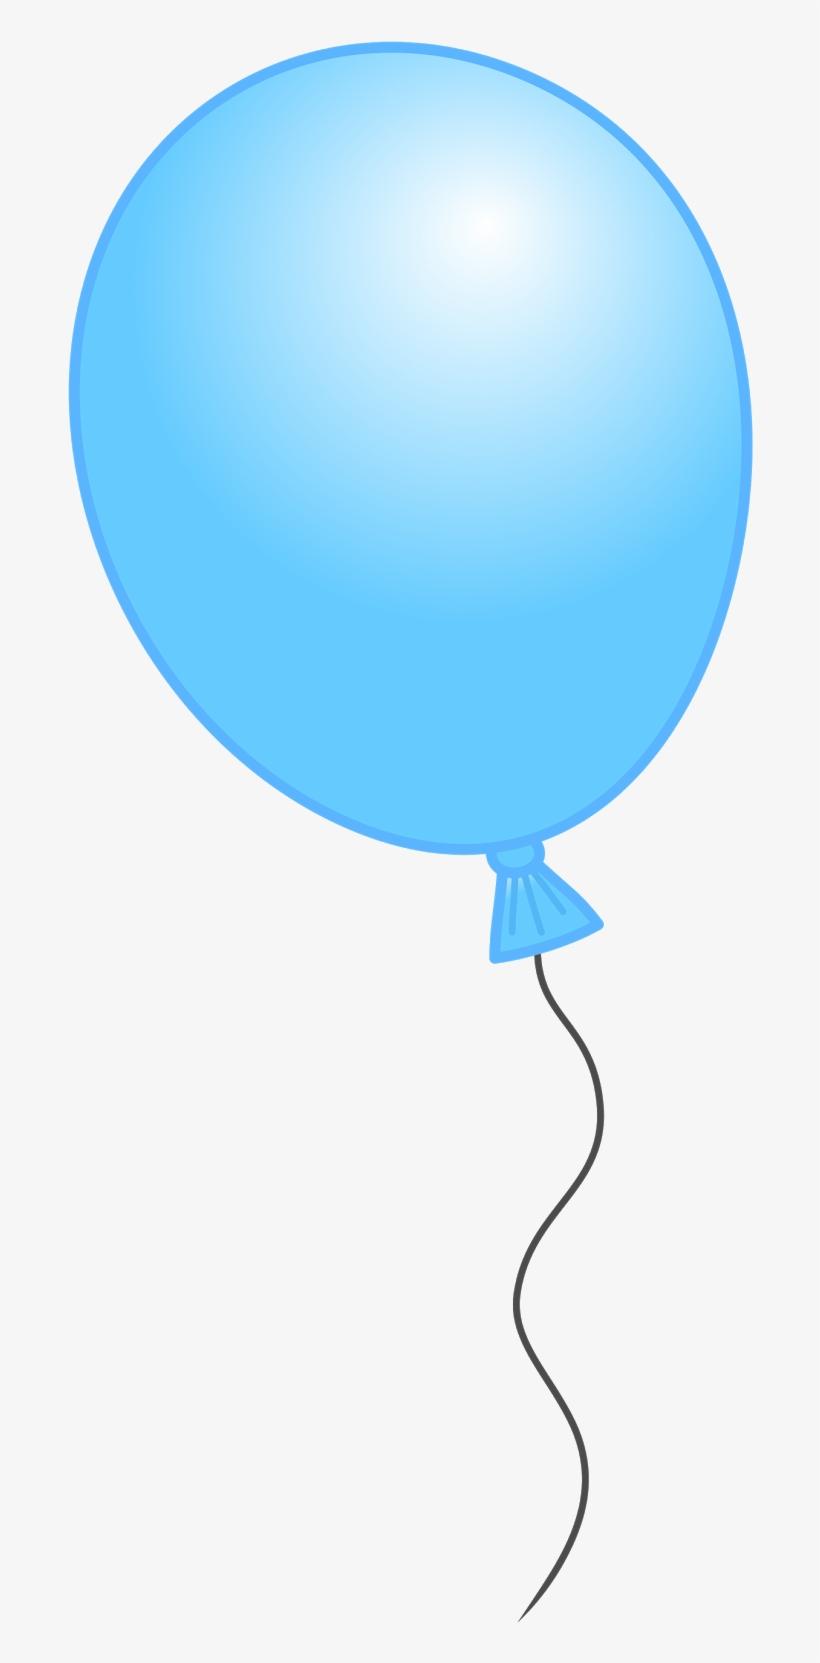 Ballon Clipart Individual Balloon Light Blue Balloon Clip Art Transparent Png 719x1600 Free Download On Nicepng